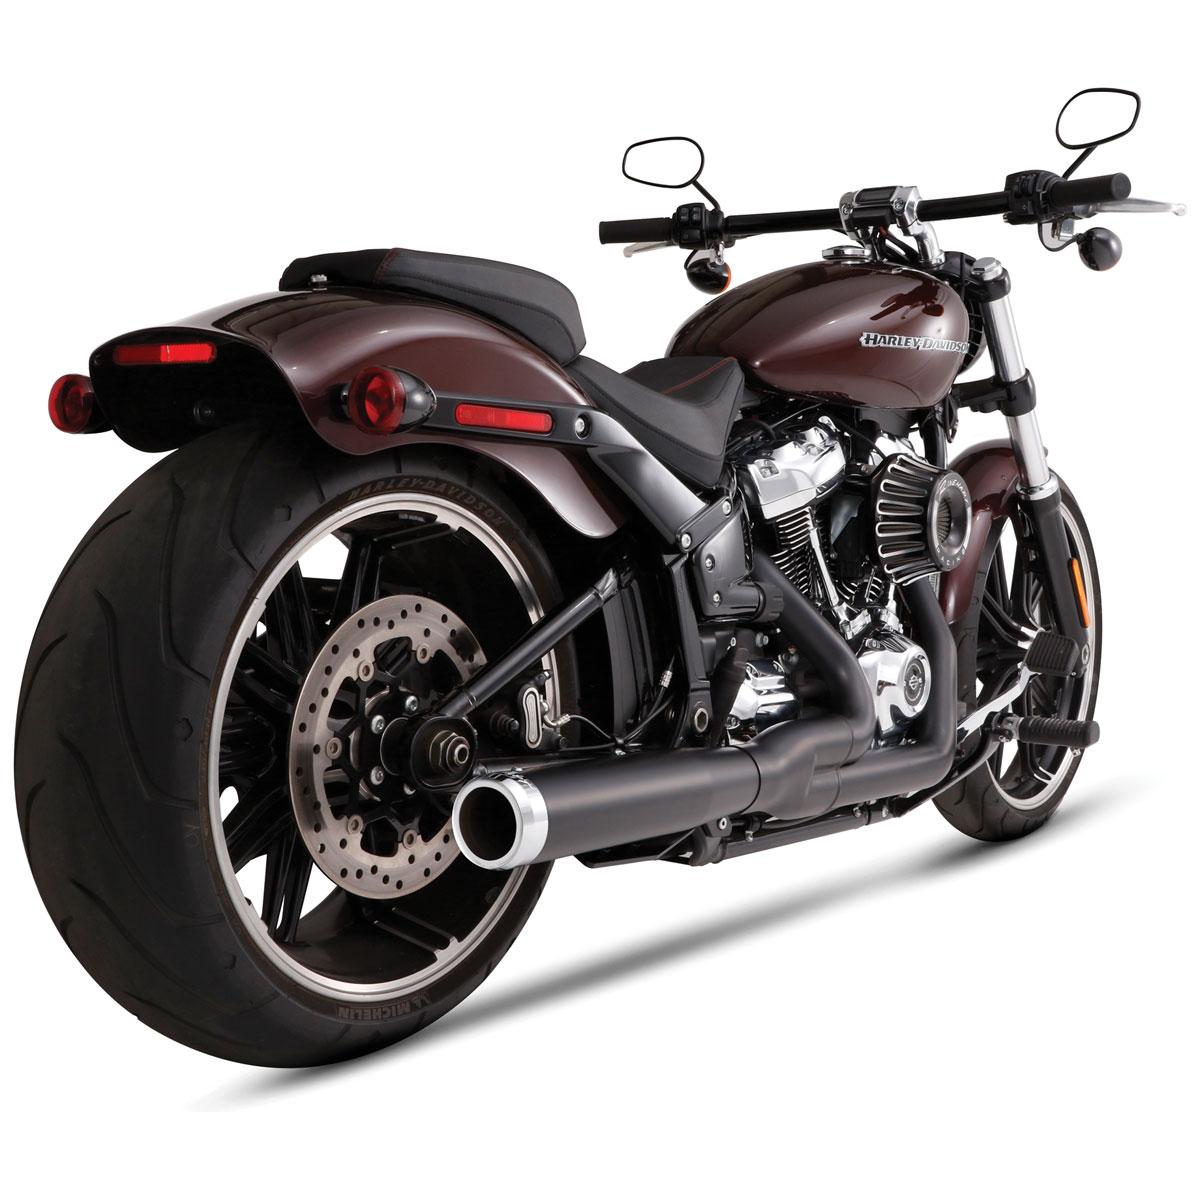 http istasazan com auto parts accessories bwdnb into rinehart exhaust pipe muffler black 210719